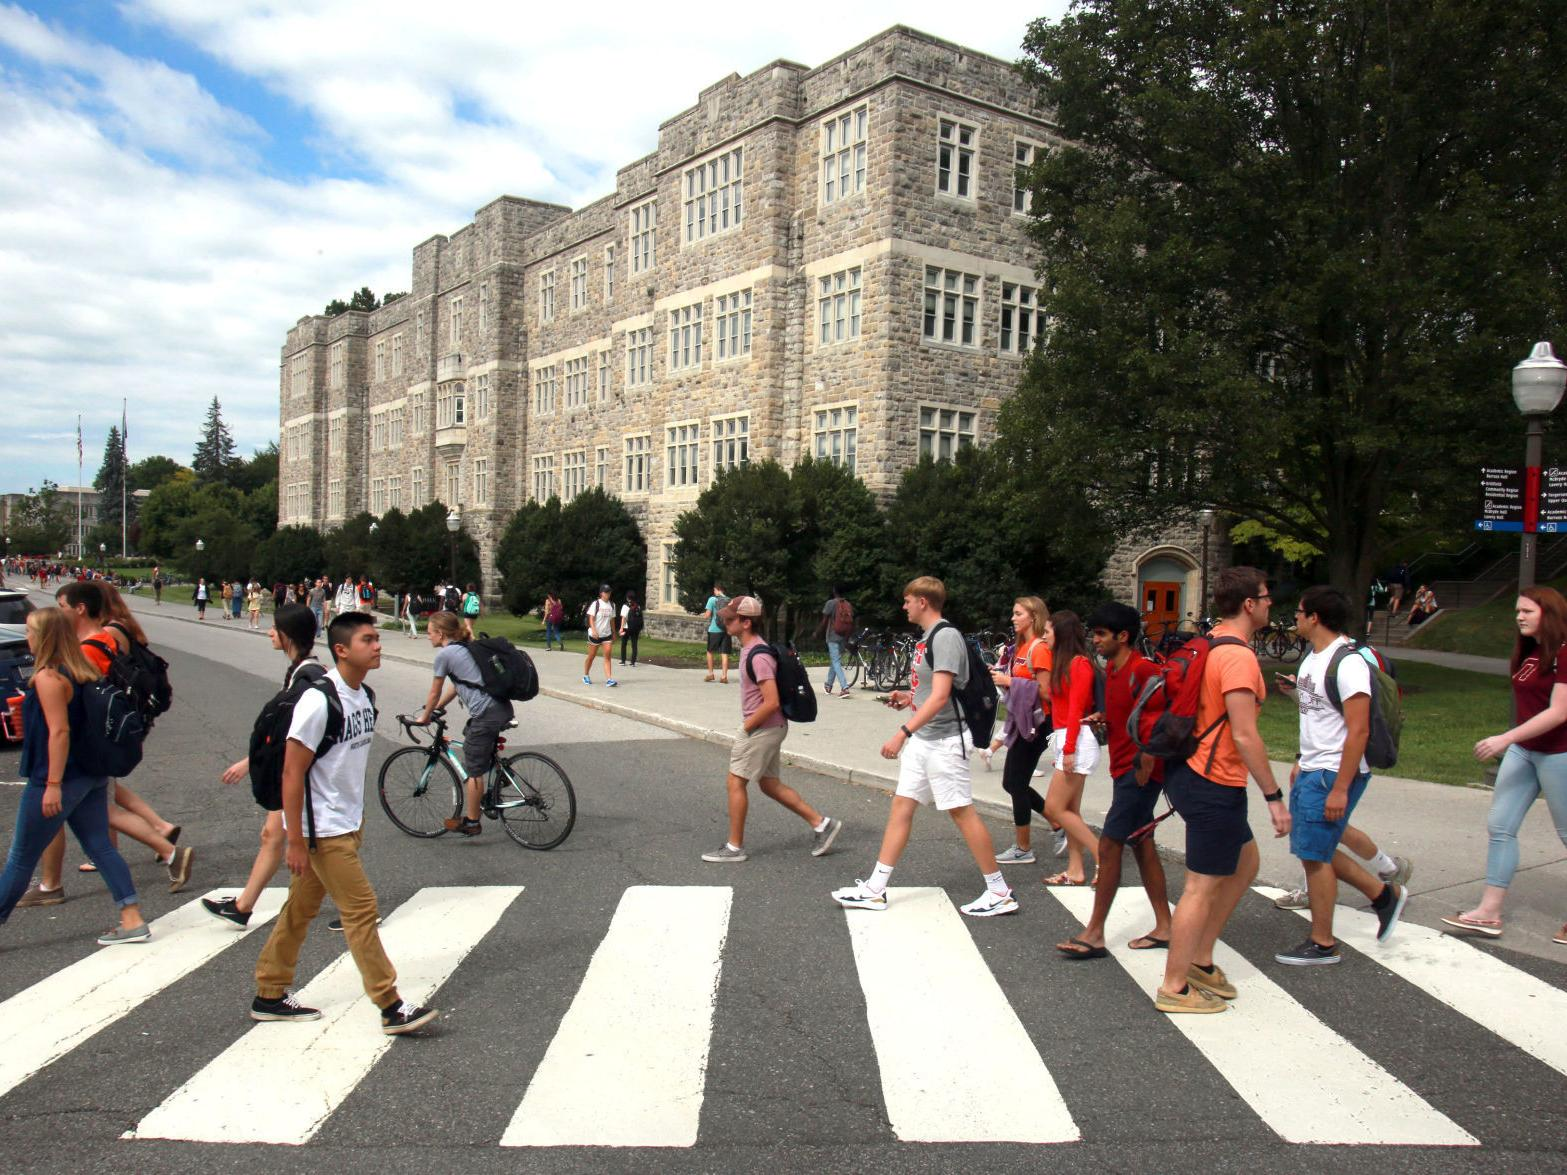 Virginia Tech Radford University Move Classes Online Amid Coronavirus Pandemic Education Roanoke Com